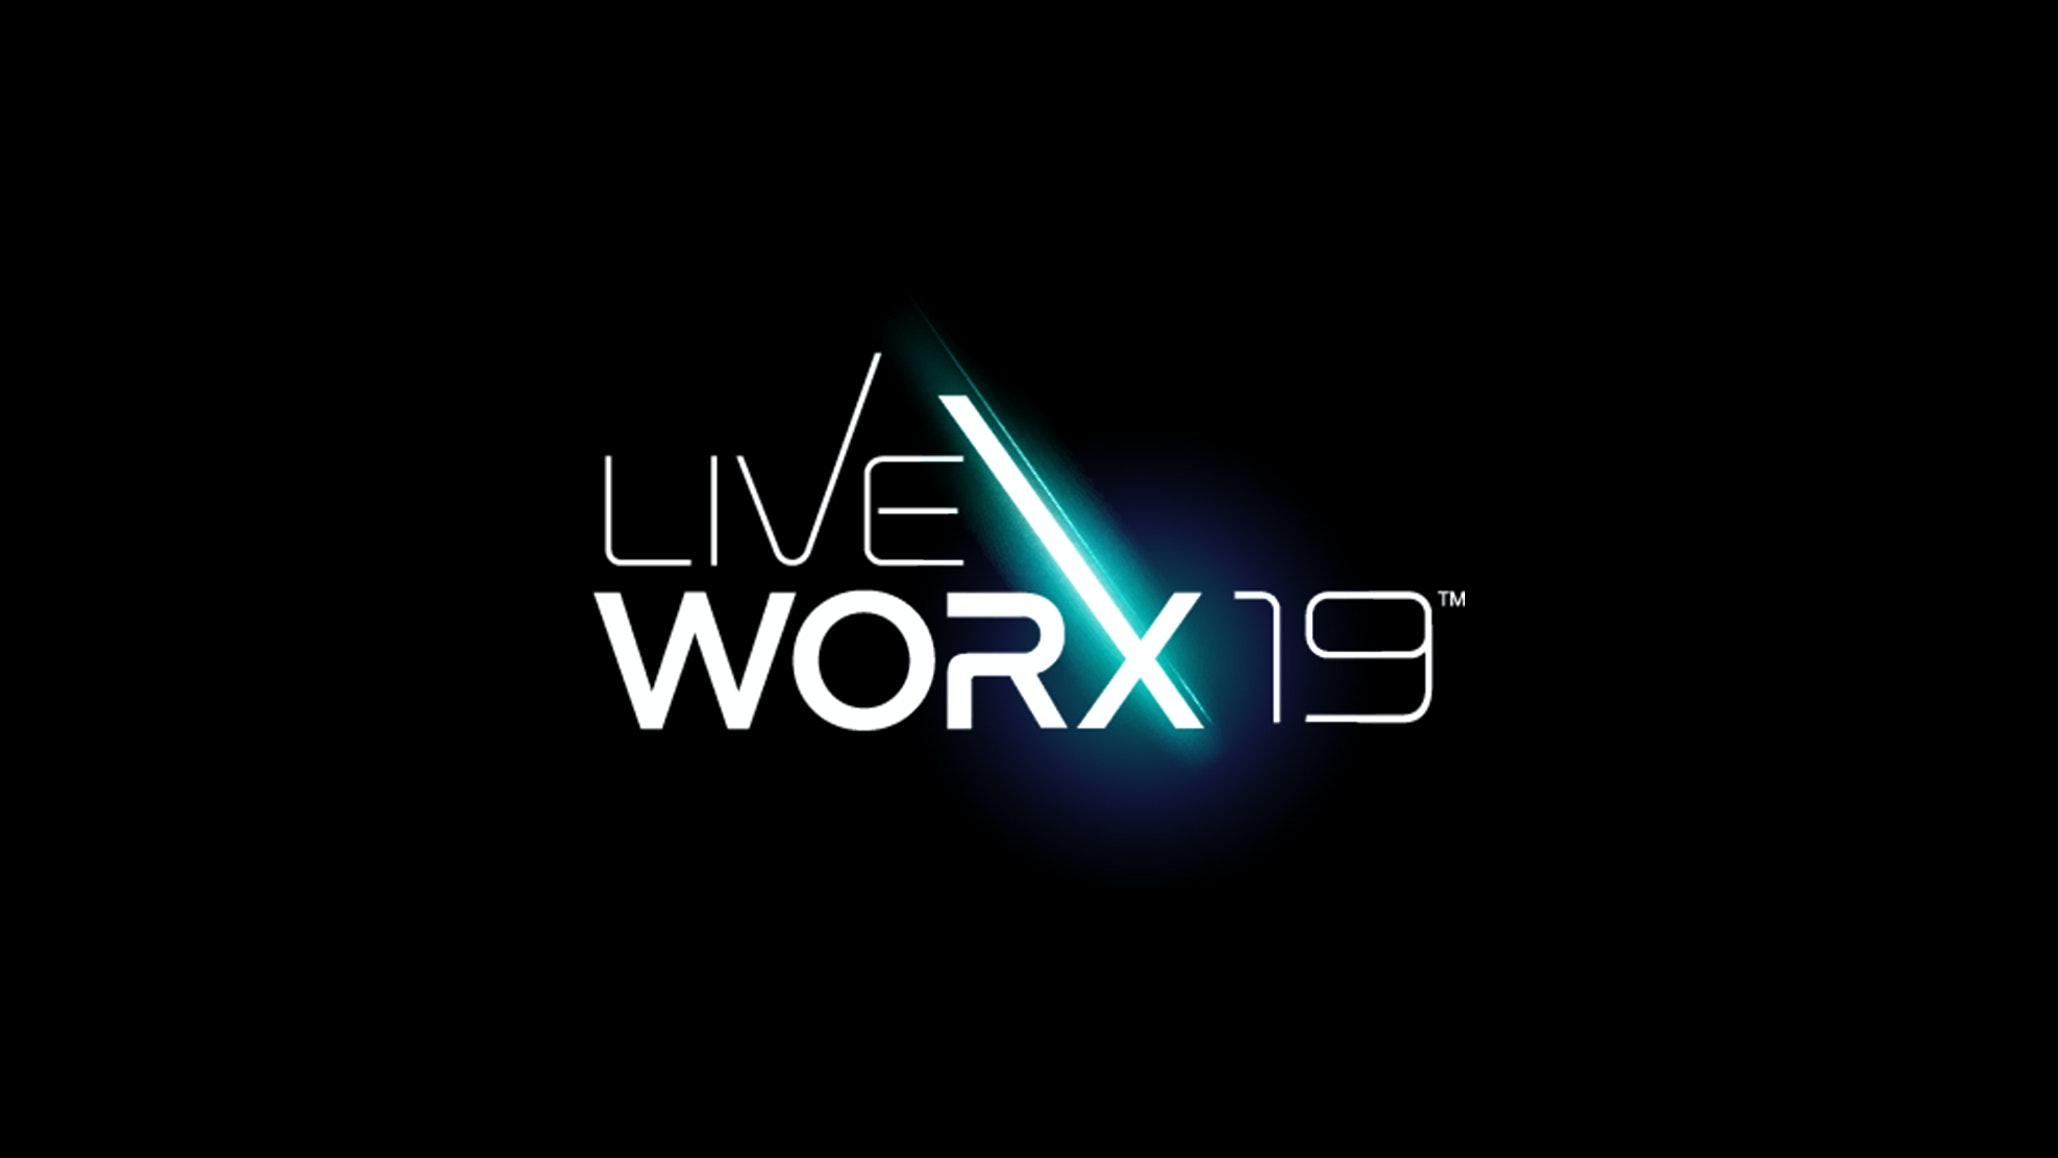 LiveWorx